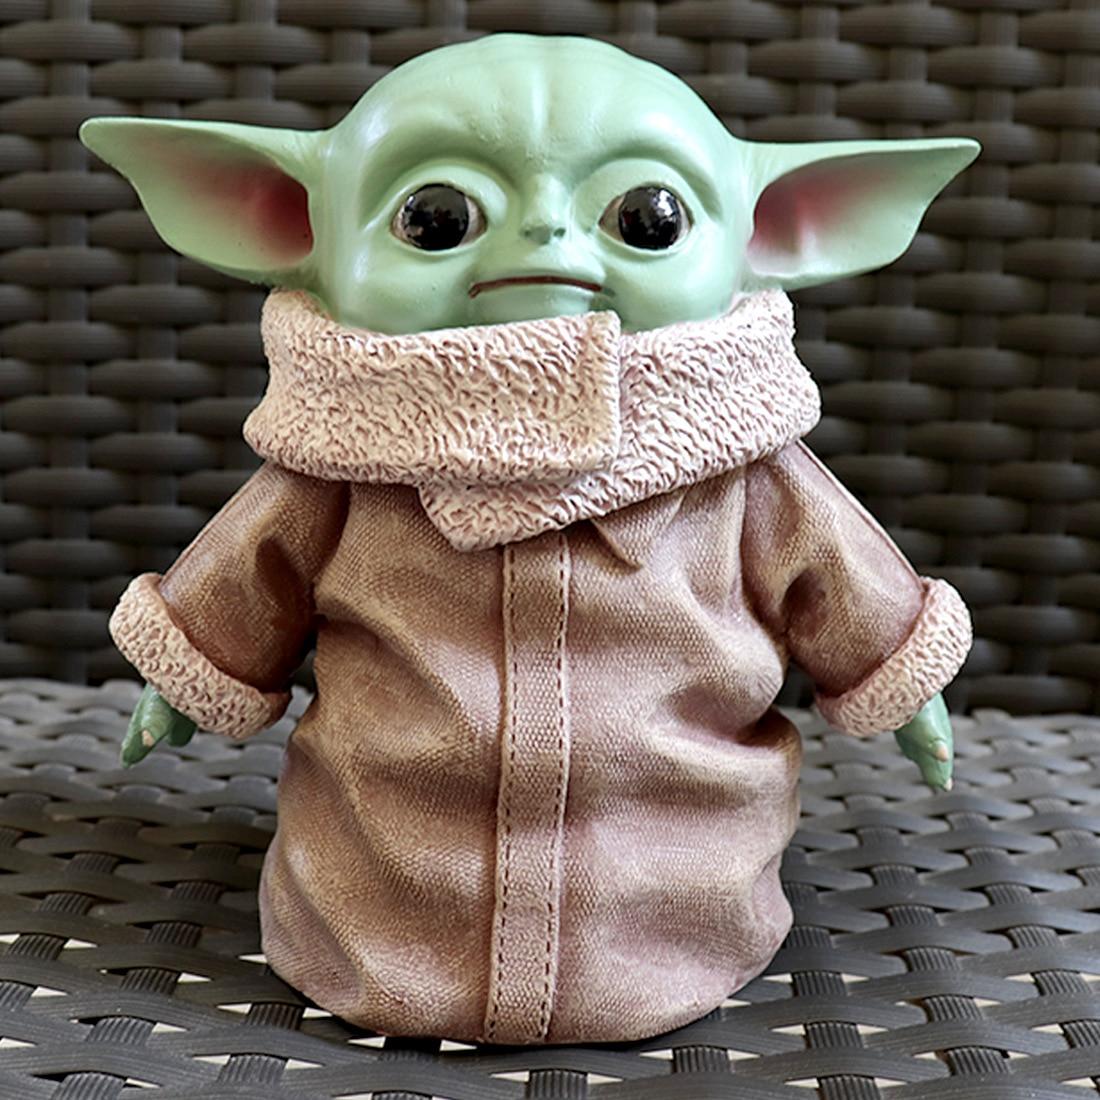 15cm Star Wars Plush Yoda Baby Ornament The Mandalorian Yoda Baby Plush Doll Lifelike Perfect Model Toys